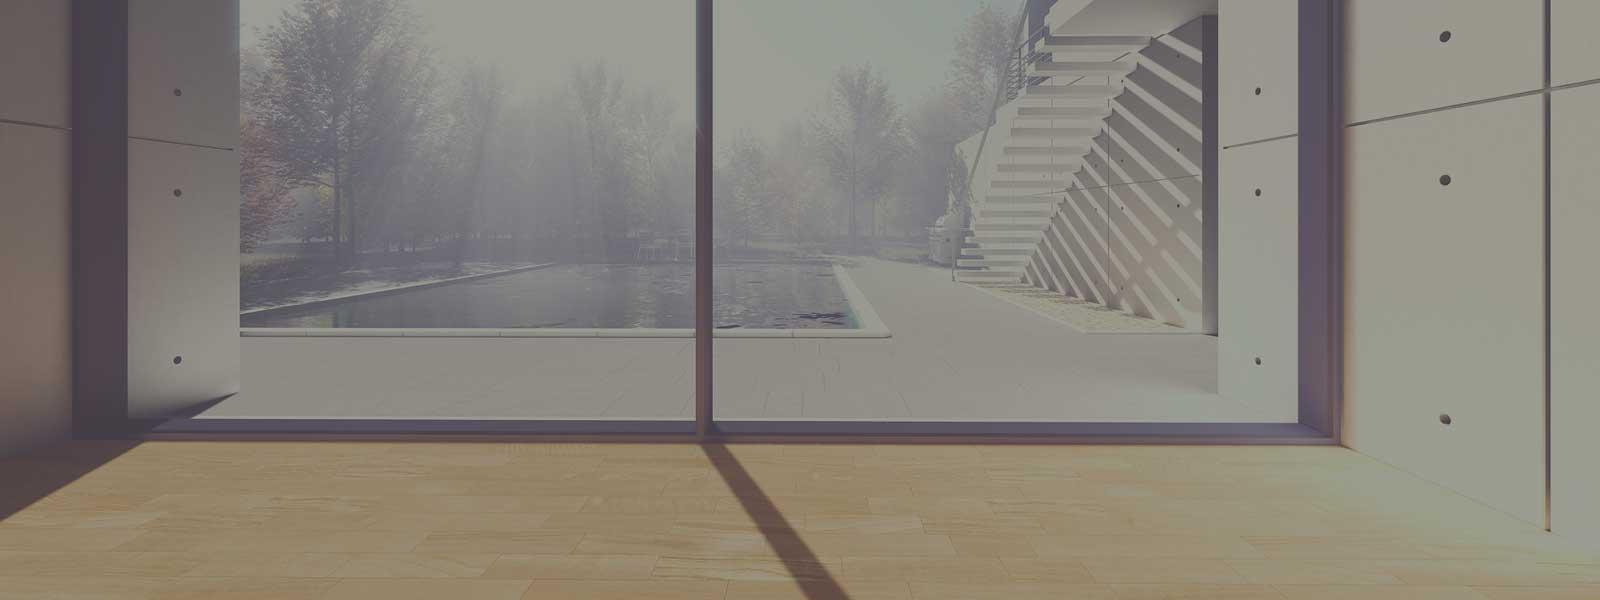 Nettoyage_vide-maison